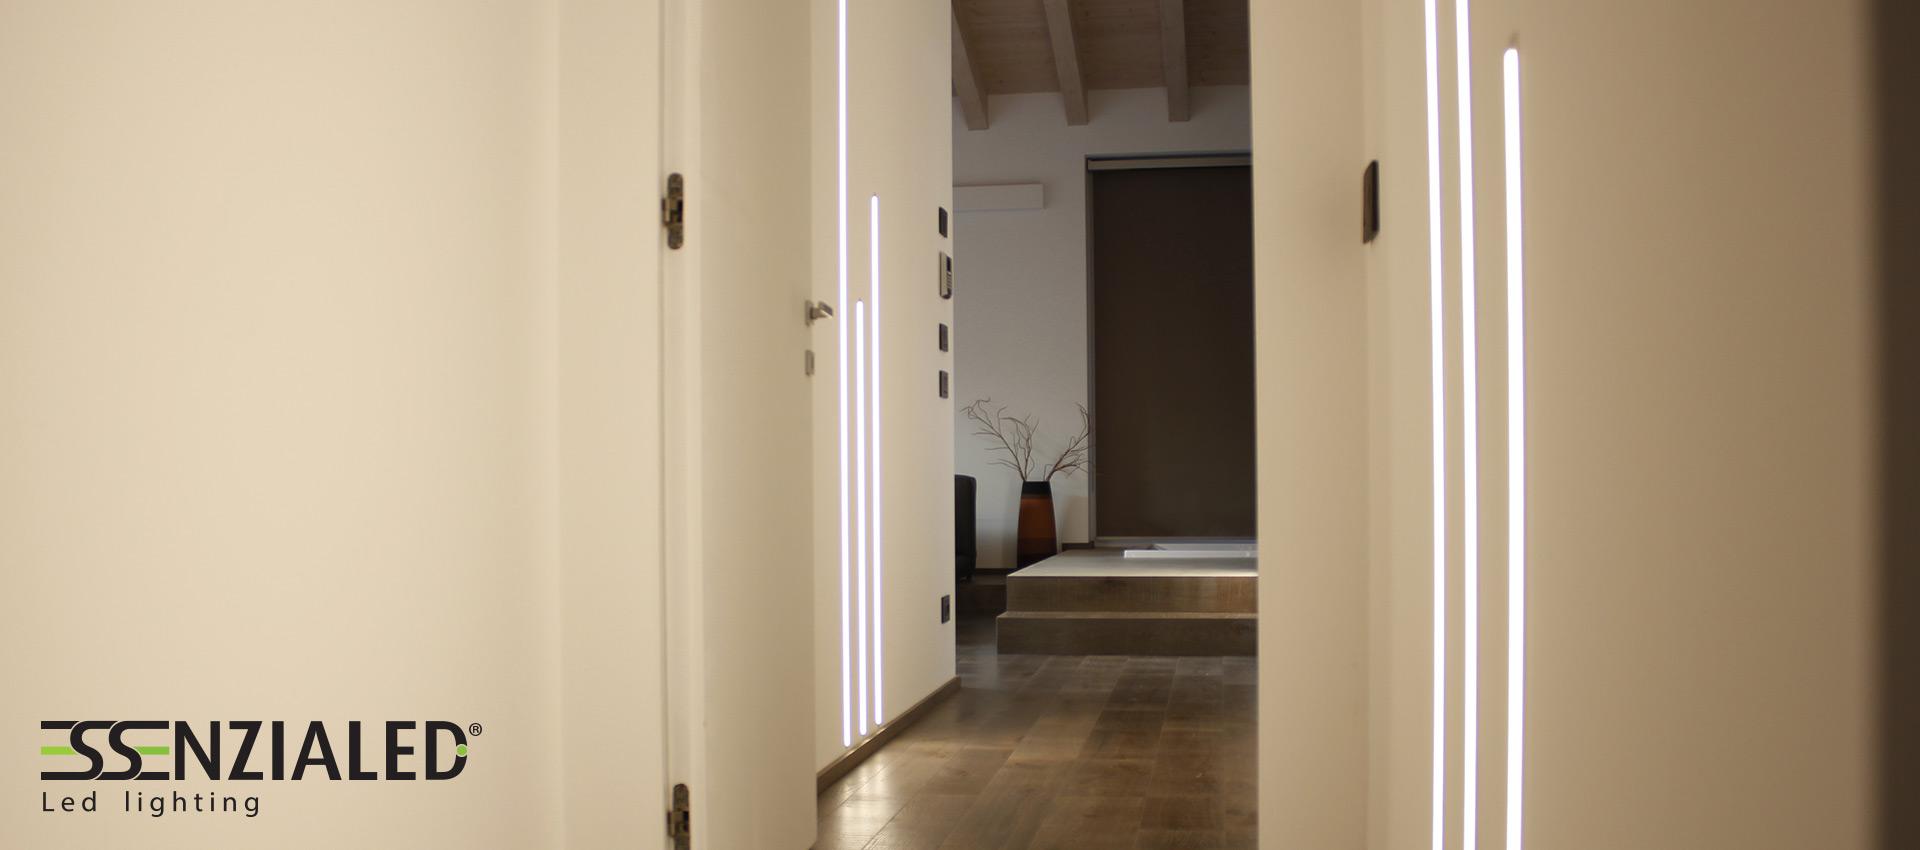 Faretti Da Incasso Bagno in - lampade da incasso per mobili - essenzialedessenzialed